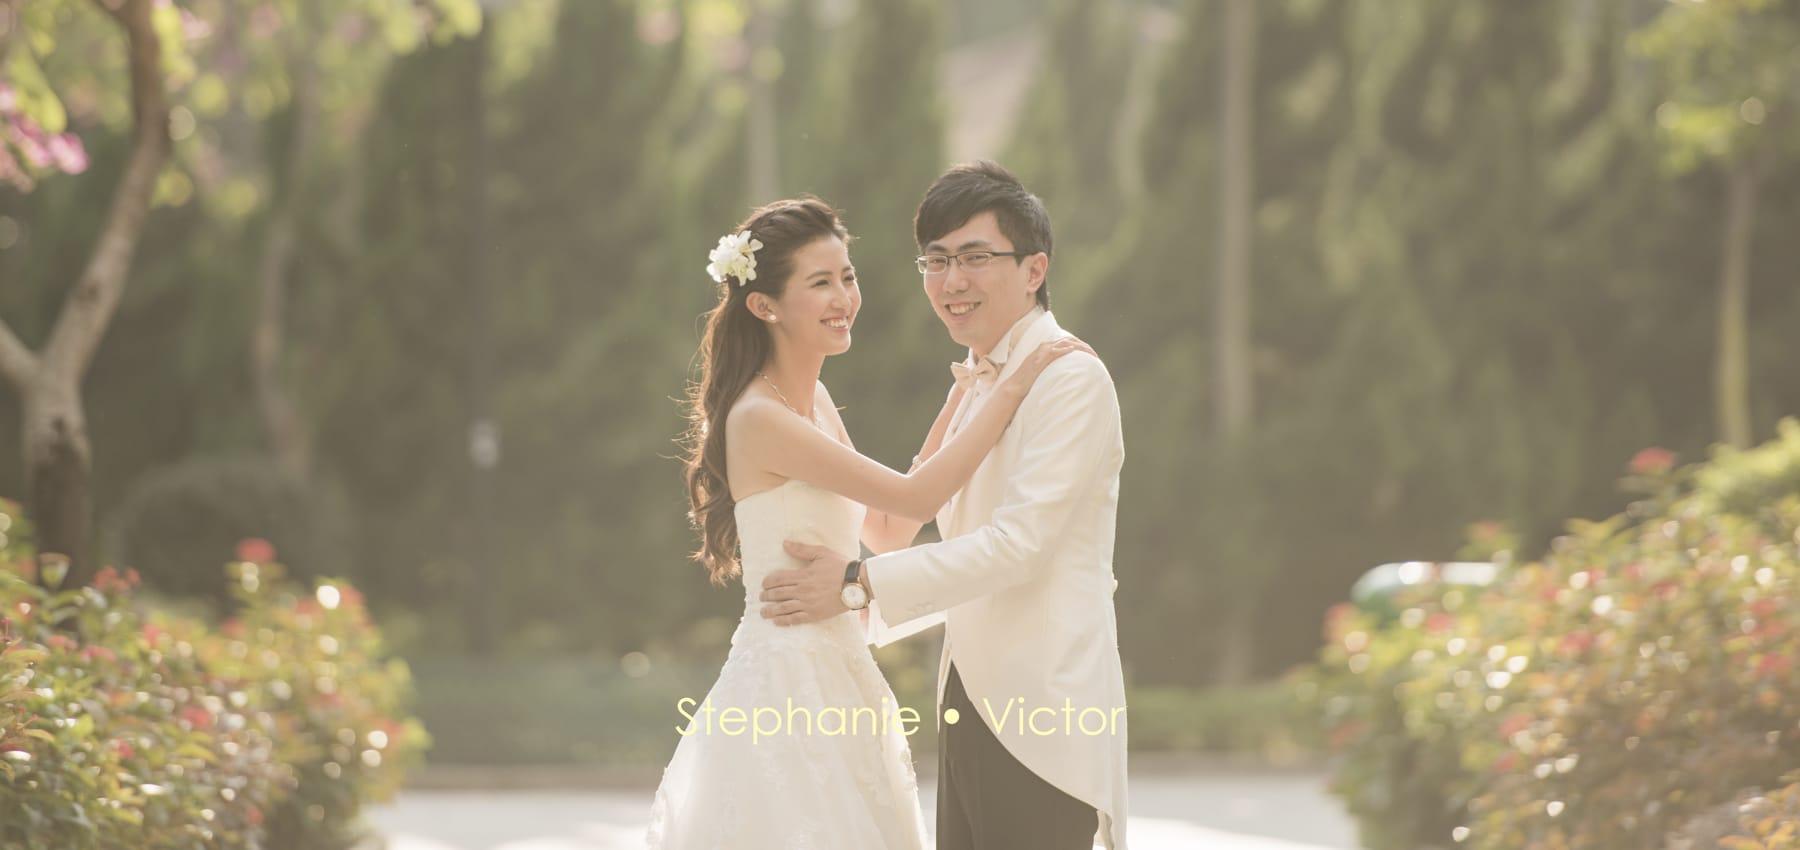 Stephanie and Victor wedding day same day edit